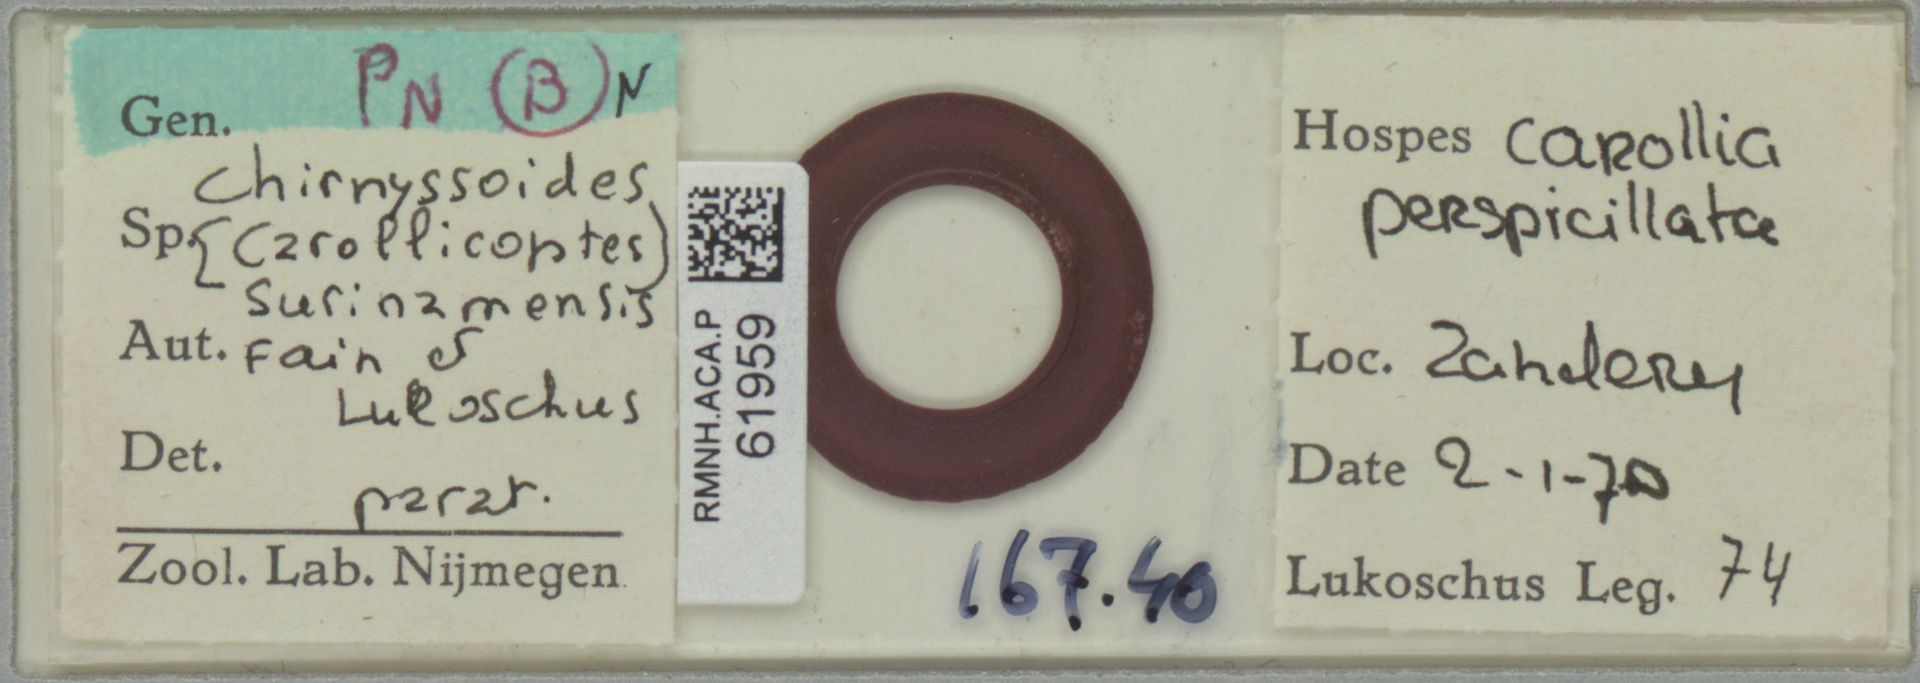 RMNH.ACA.P.61959   Chirnyssoides (Carollicoptes) surinamensis Fain & Lukoschus